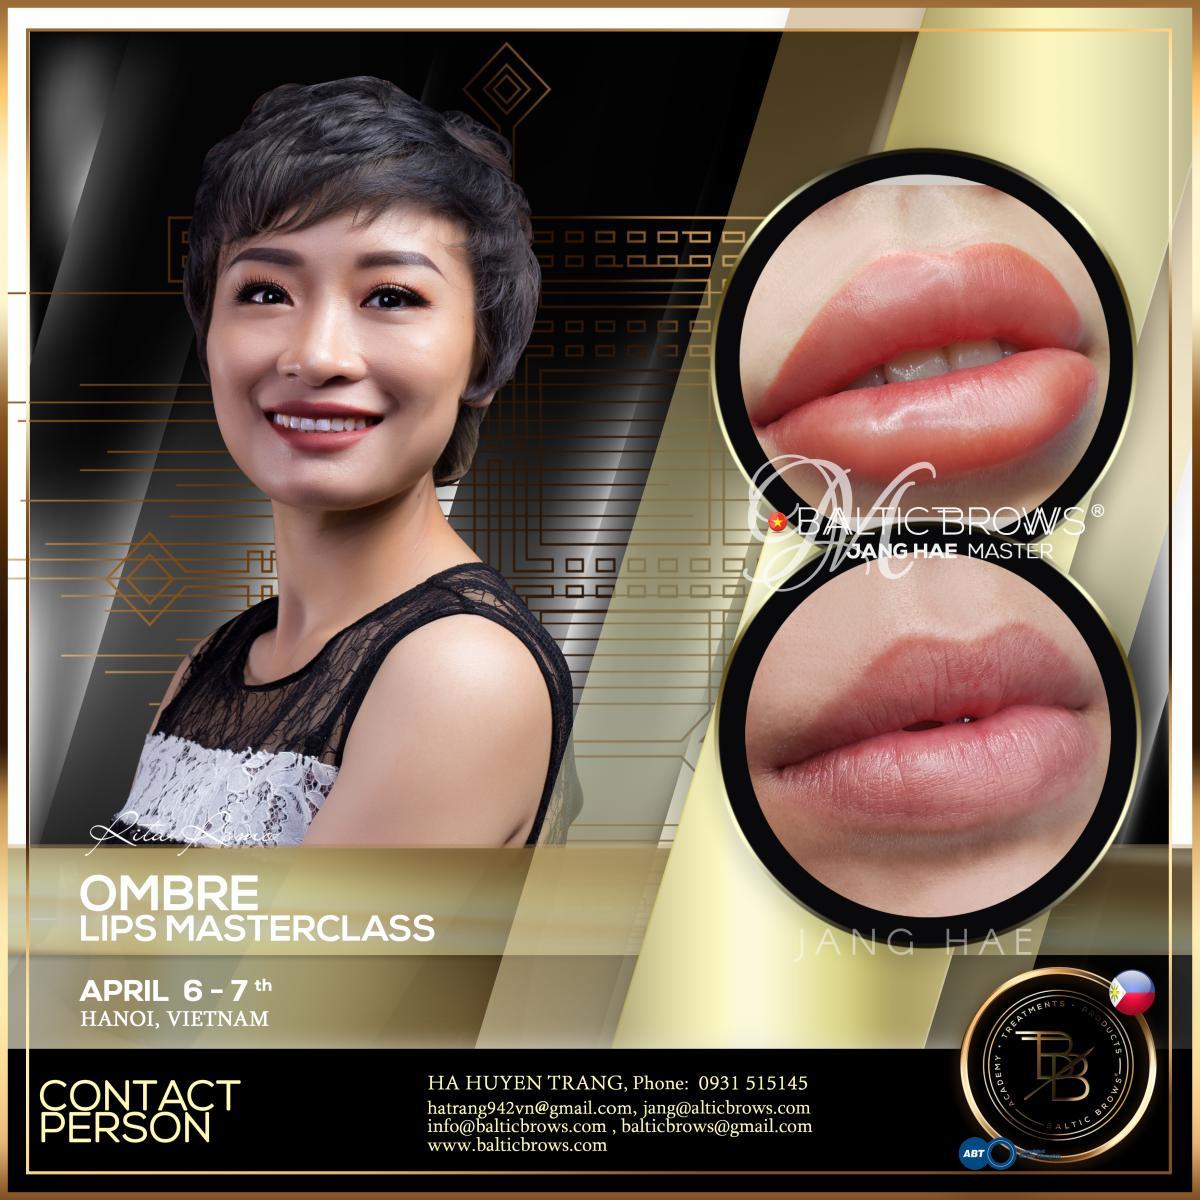 Ombre lips masterclass